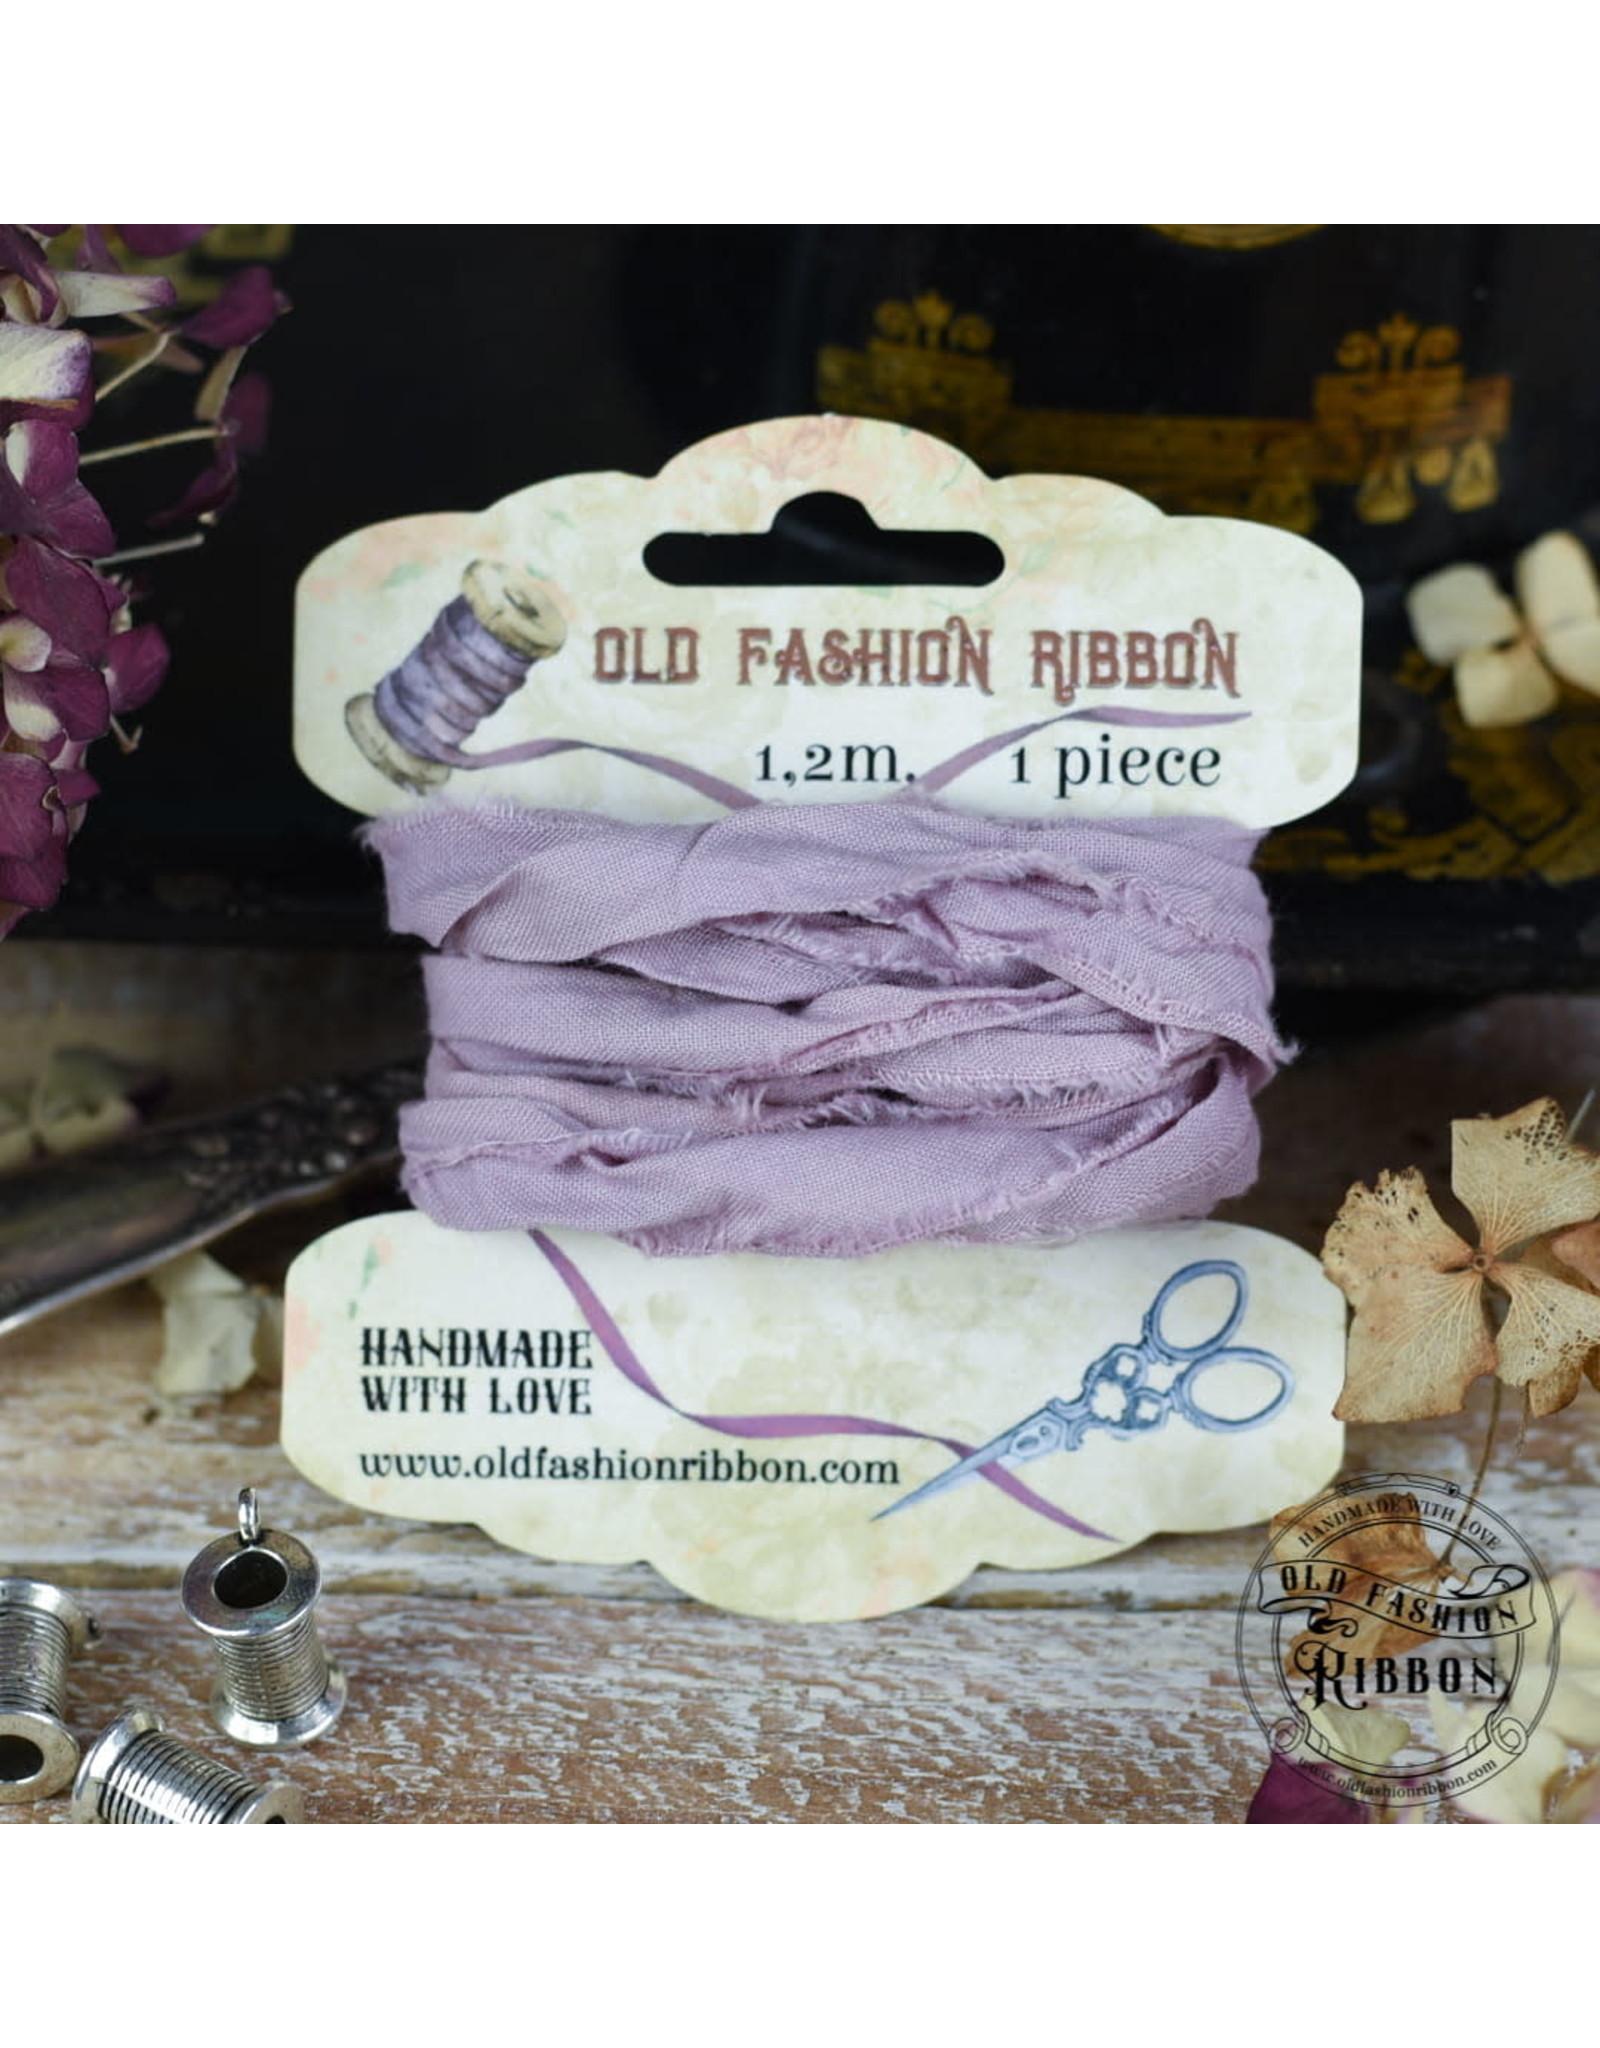 Old Fashion Ribbon Old Fashion Ribbon Linnen Vintage Dirty Lavender OLDL27